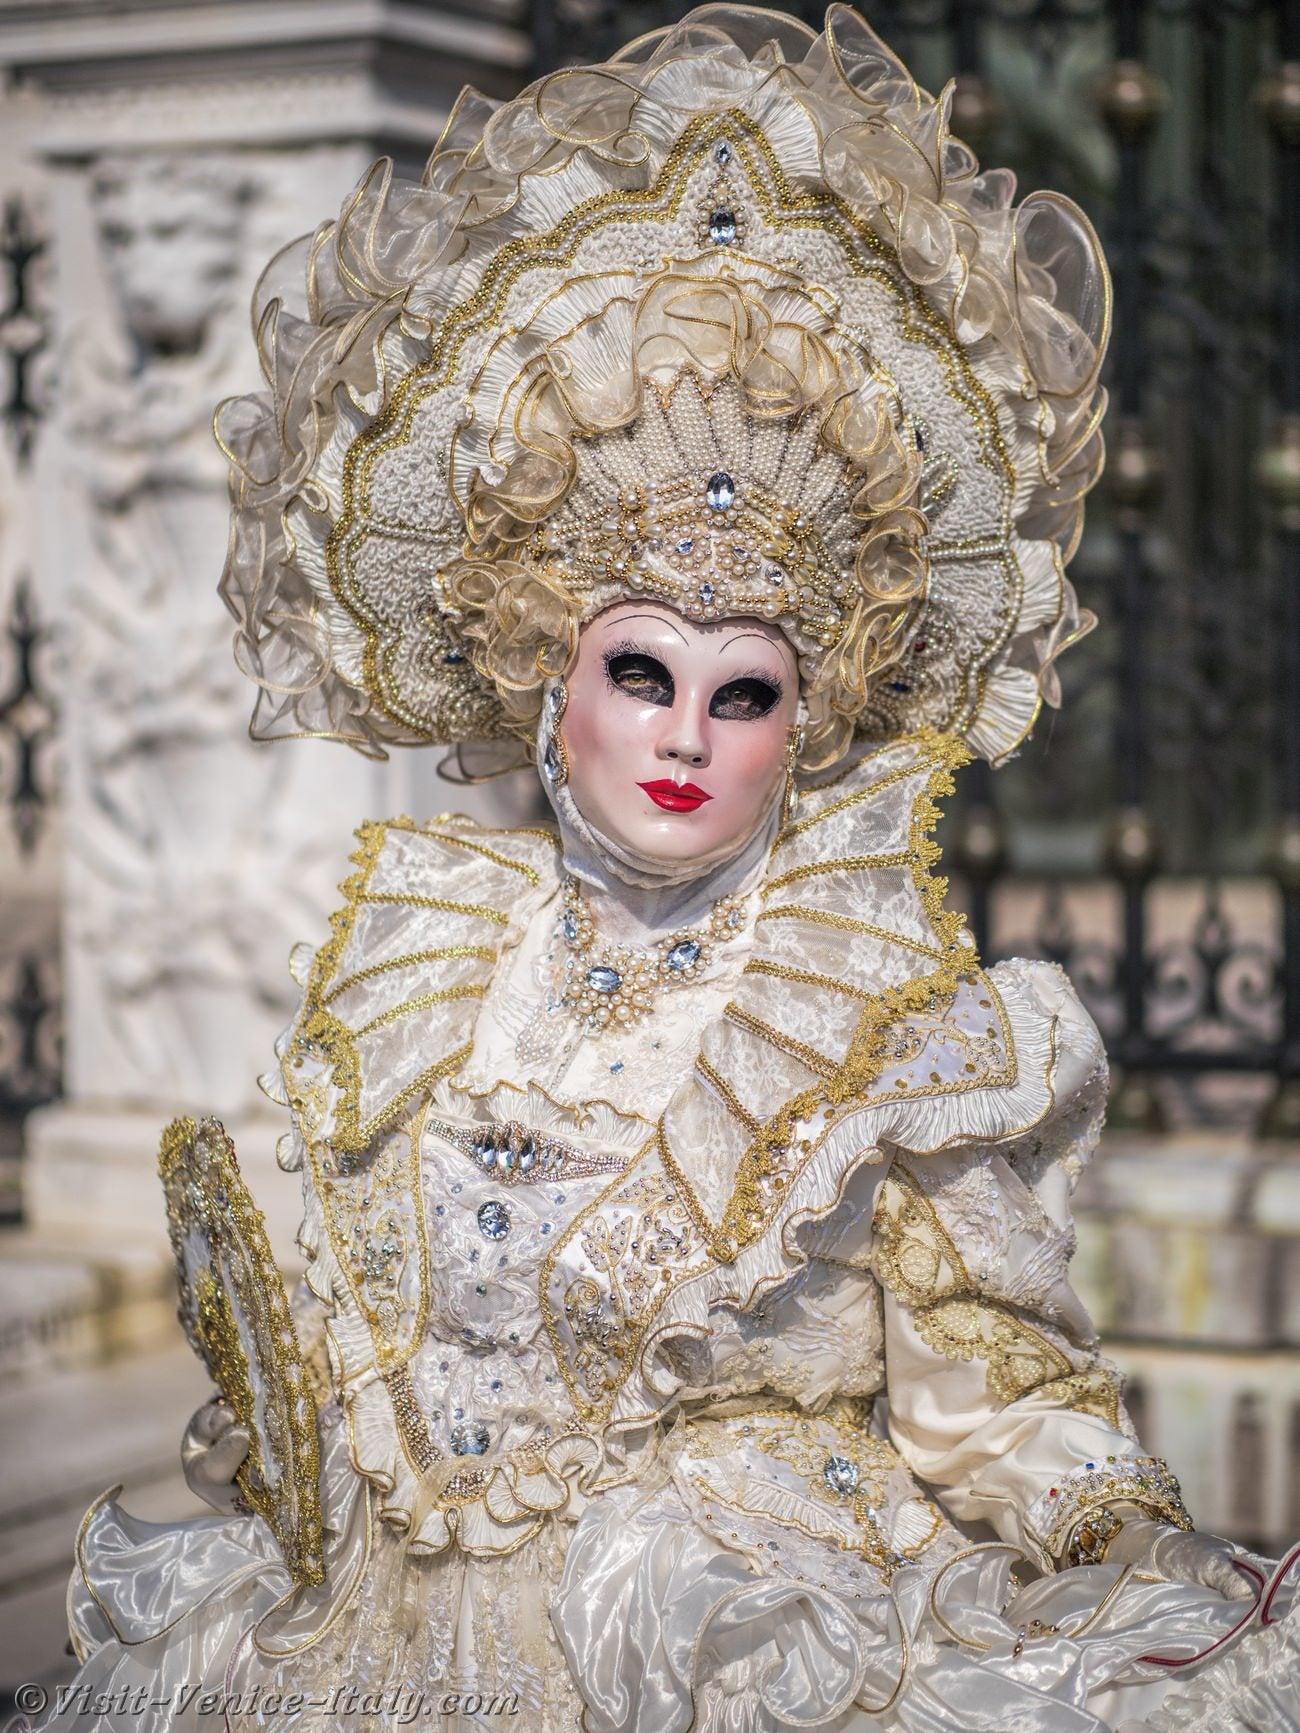 Francois Illas New Tradition: Program Venice Carnival Italy 2019 Programme Schedule